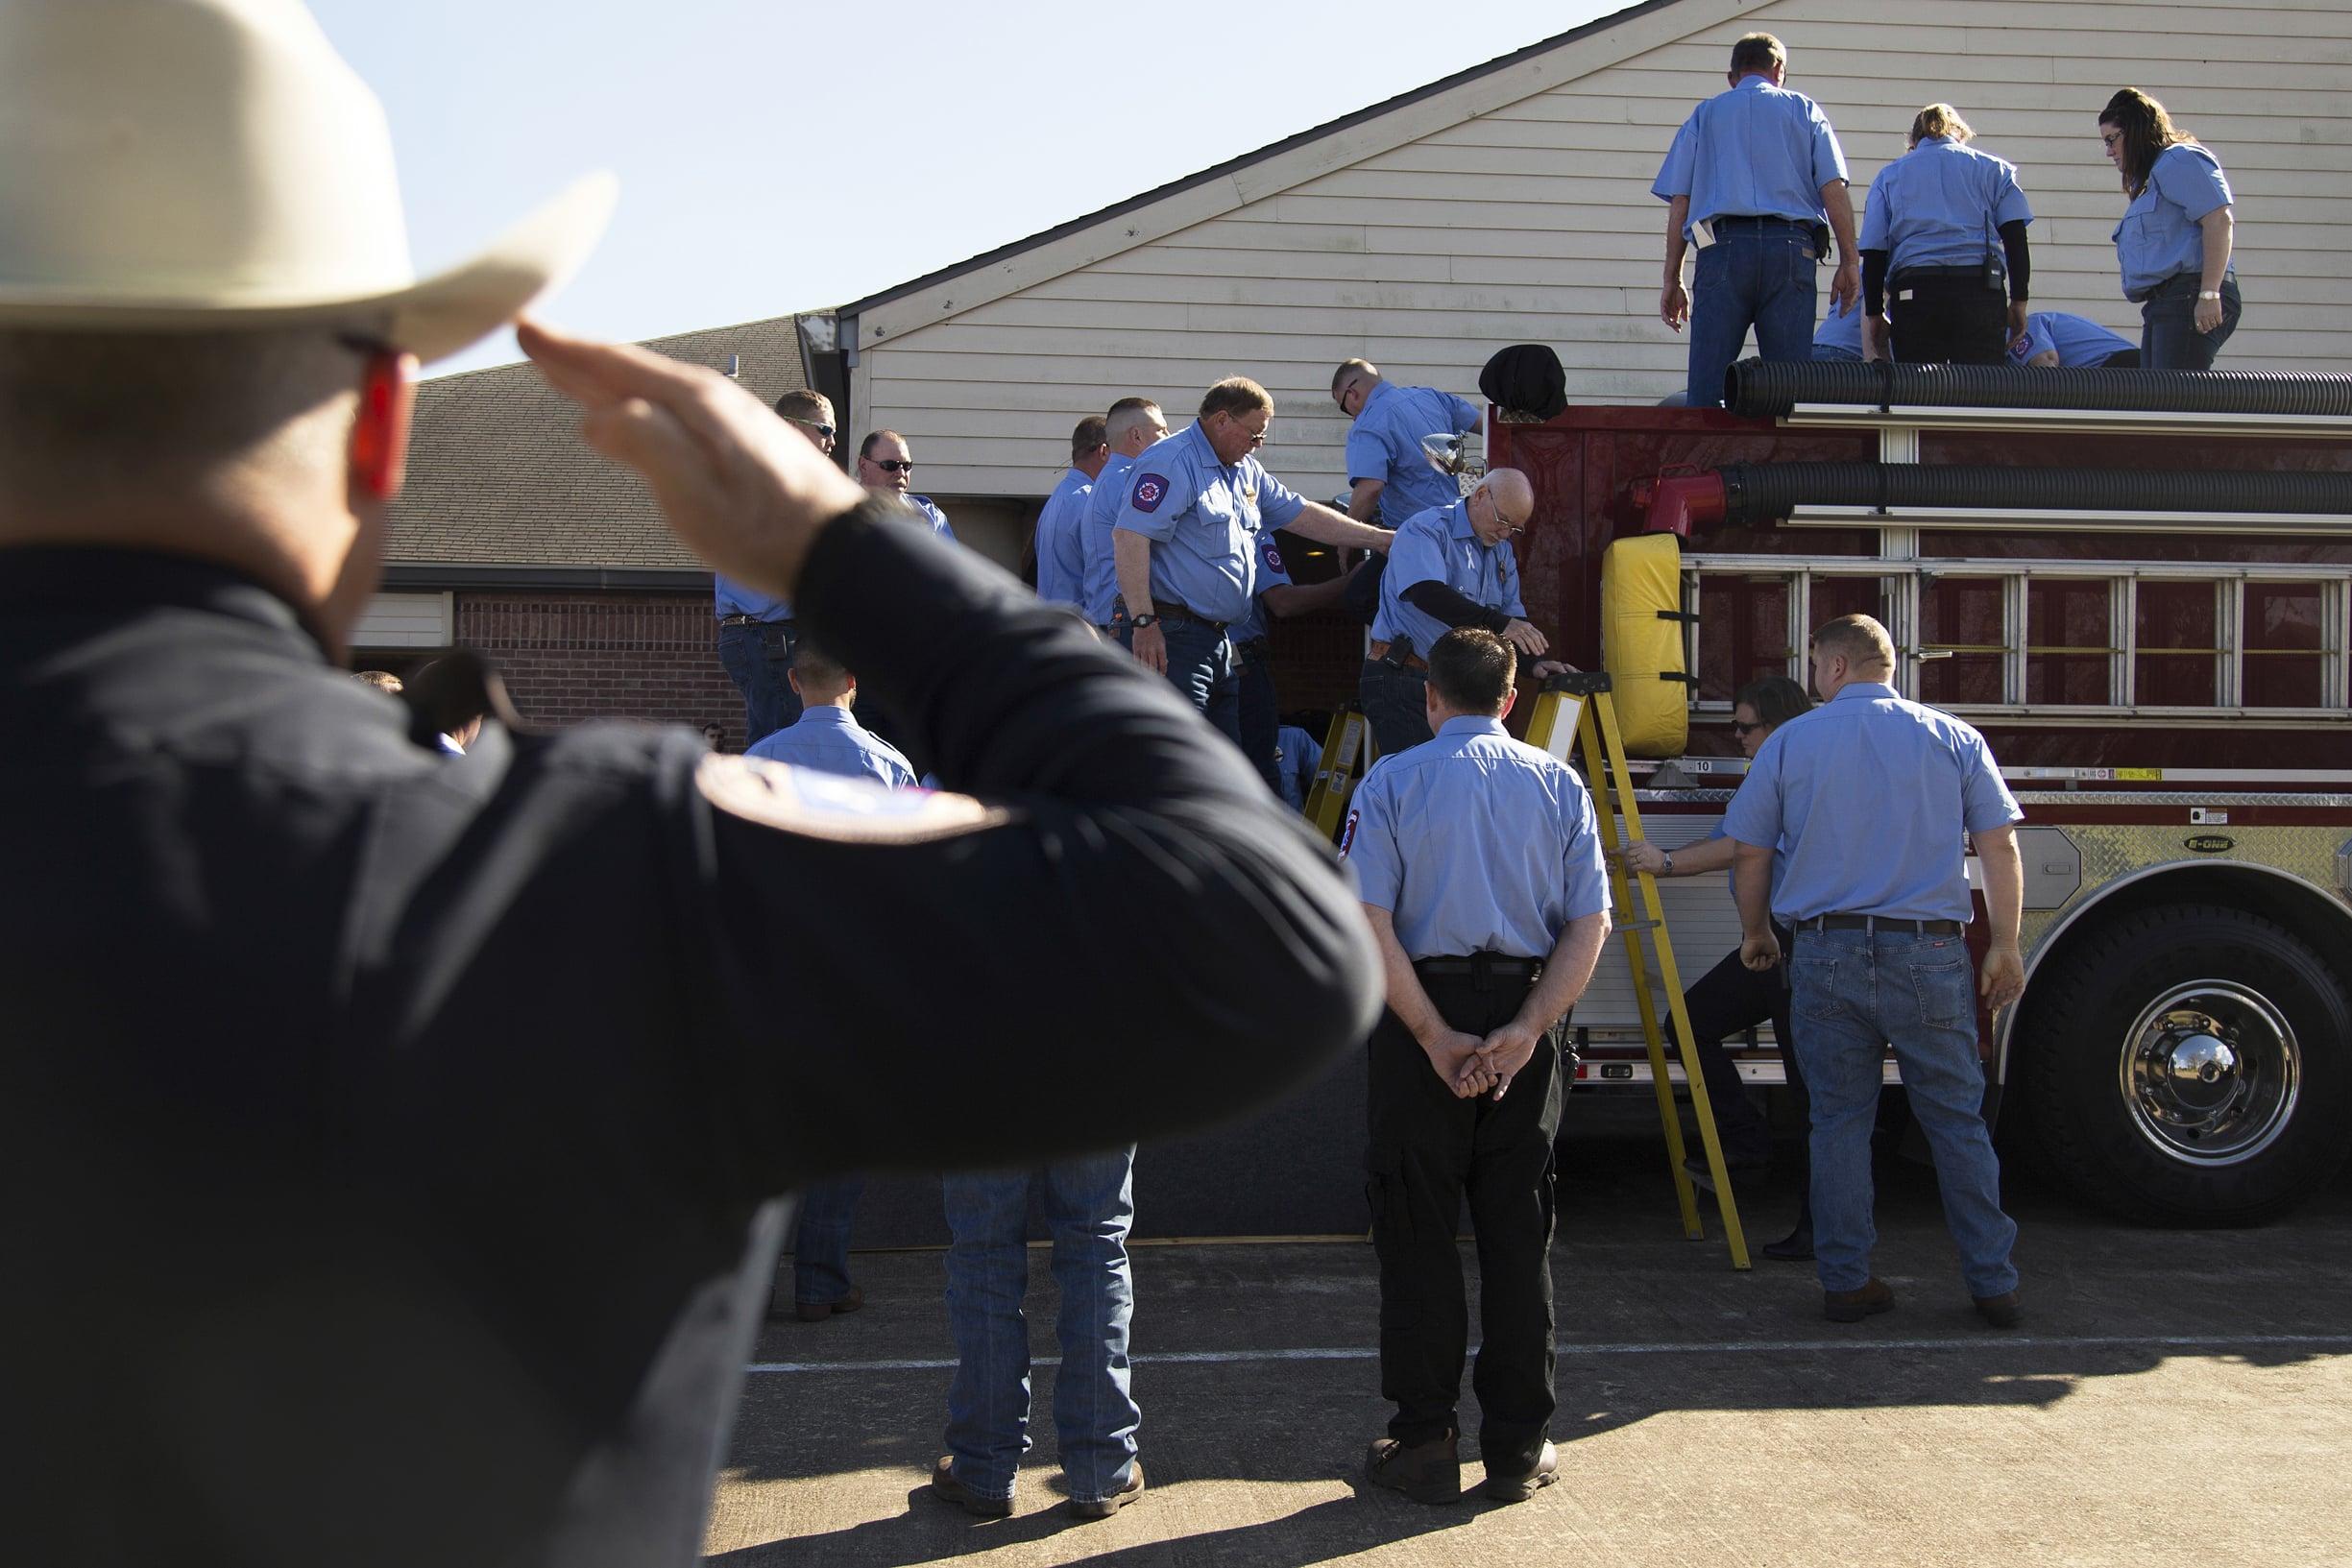 Henry's casket is loaded onto a firetruck outside the Oaklawn Funeral Home Chapel in Edna, TX.